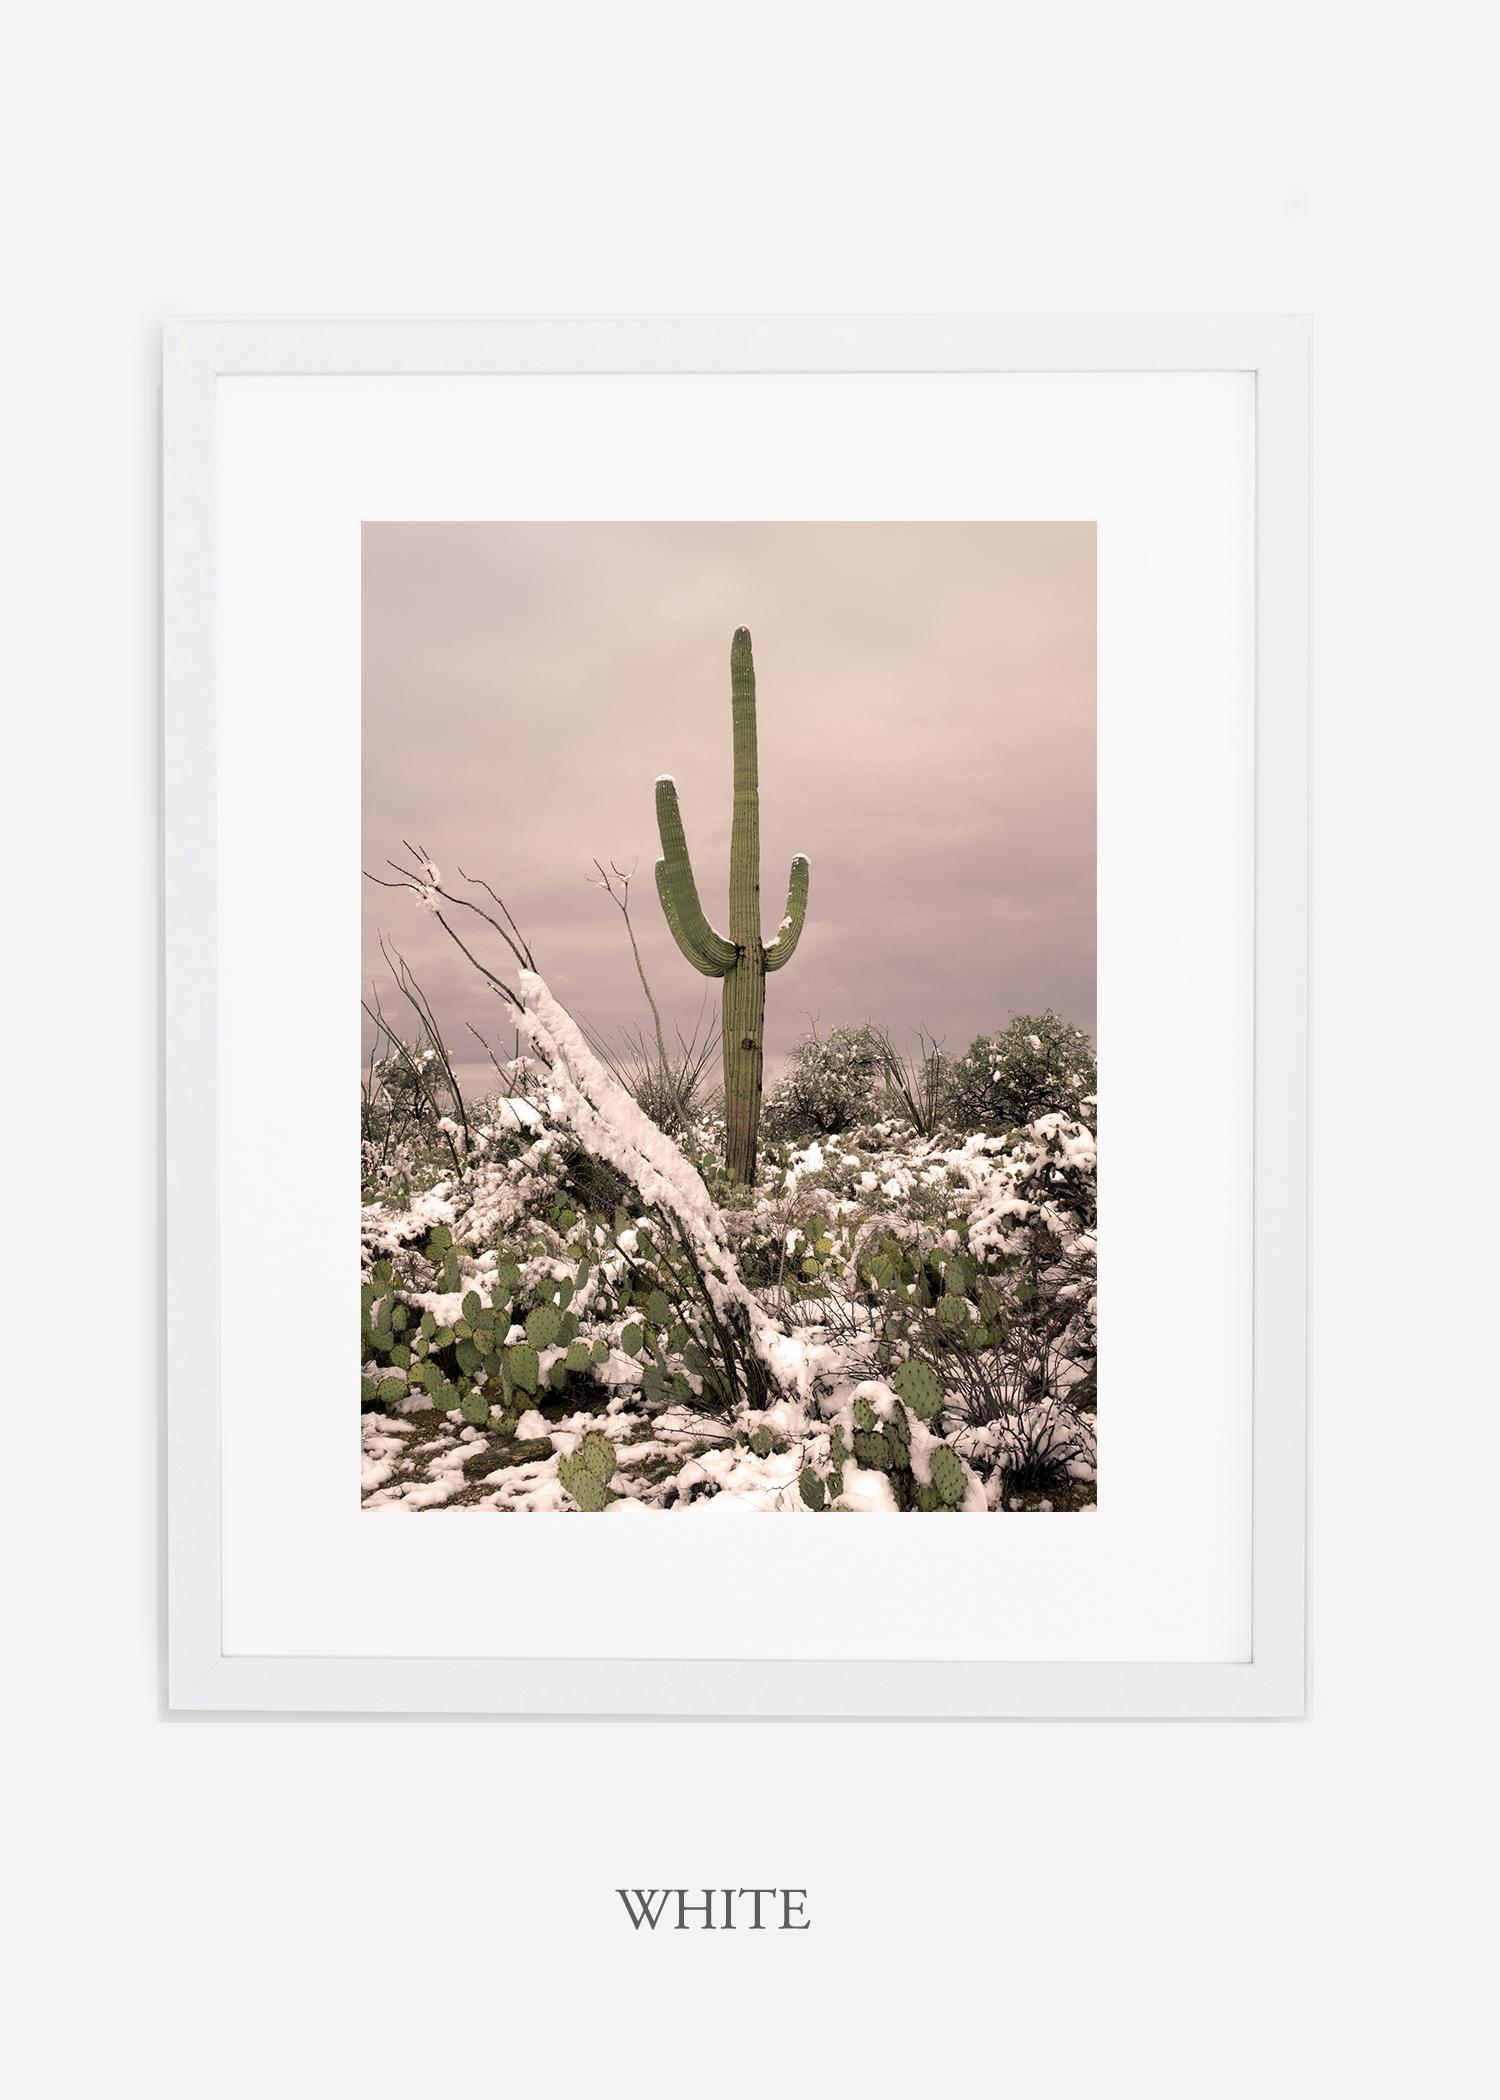 whiteframe-saguaroNo.4-wildercalifornia-art-wallart-cactusprint-homedecor-prints-arizona-botanical-artwork-interiordesign.jpg